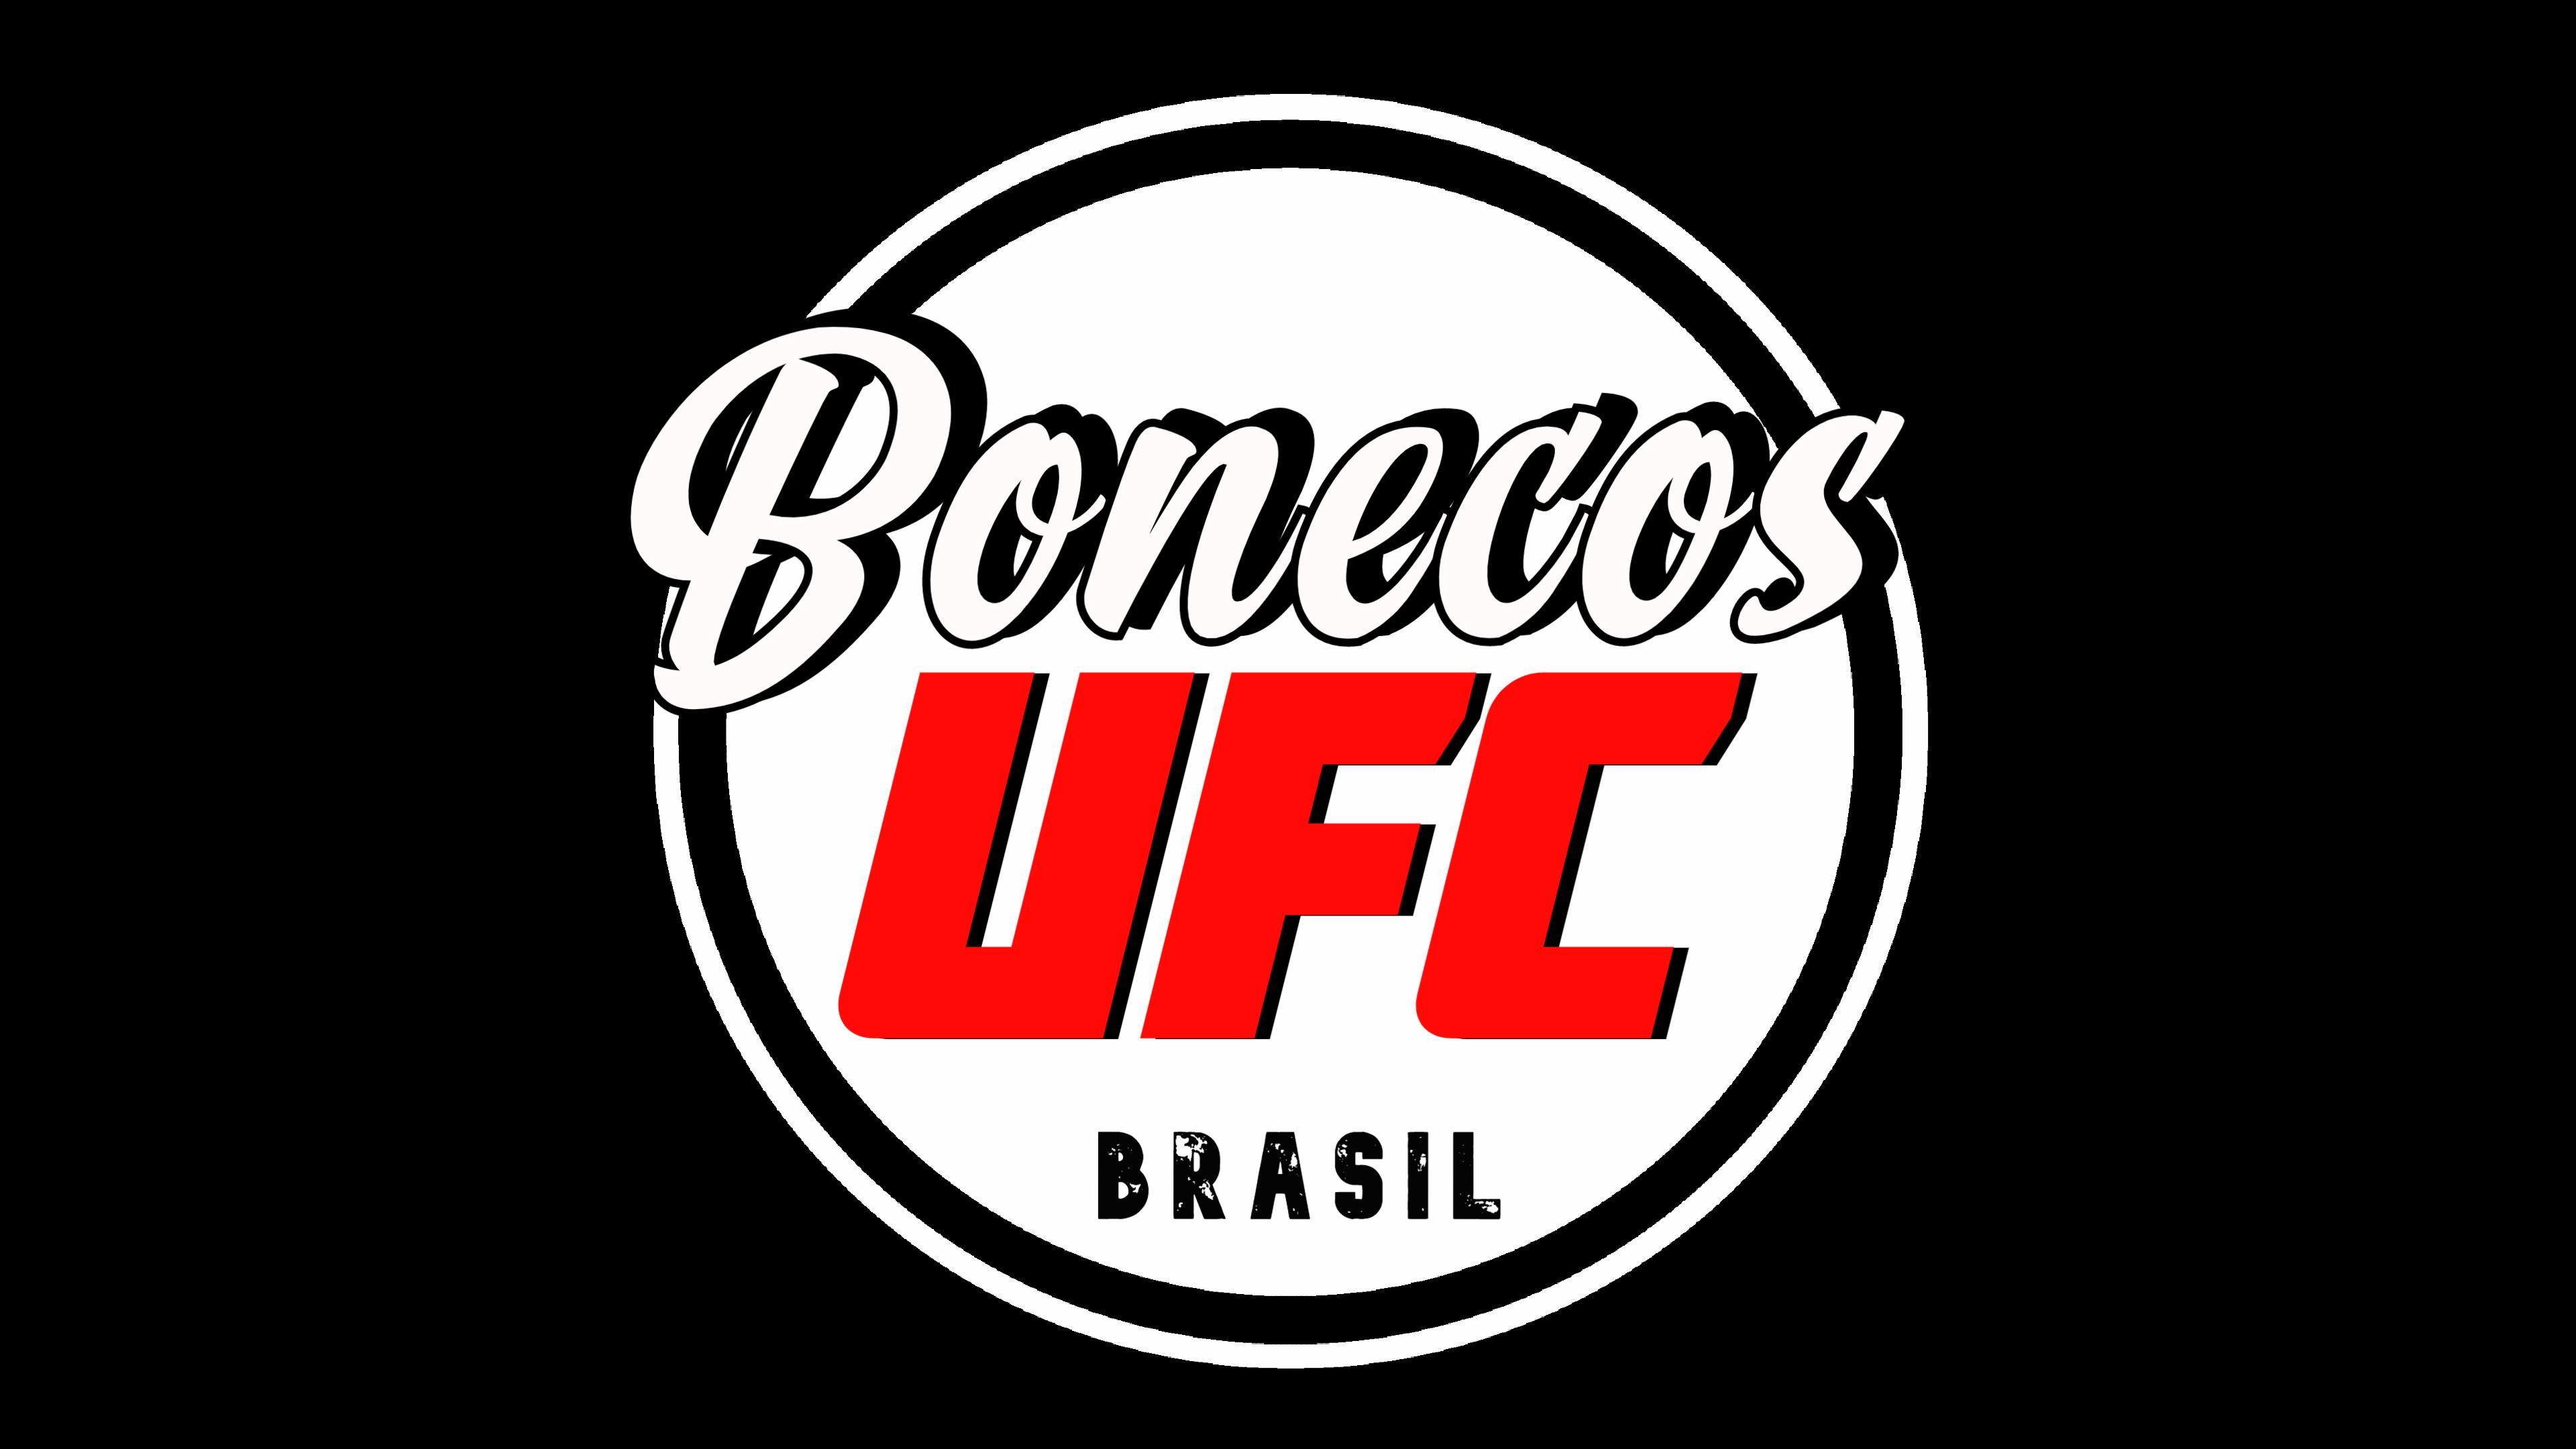 Bonecos UFC Brasil